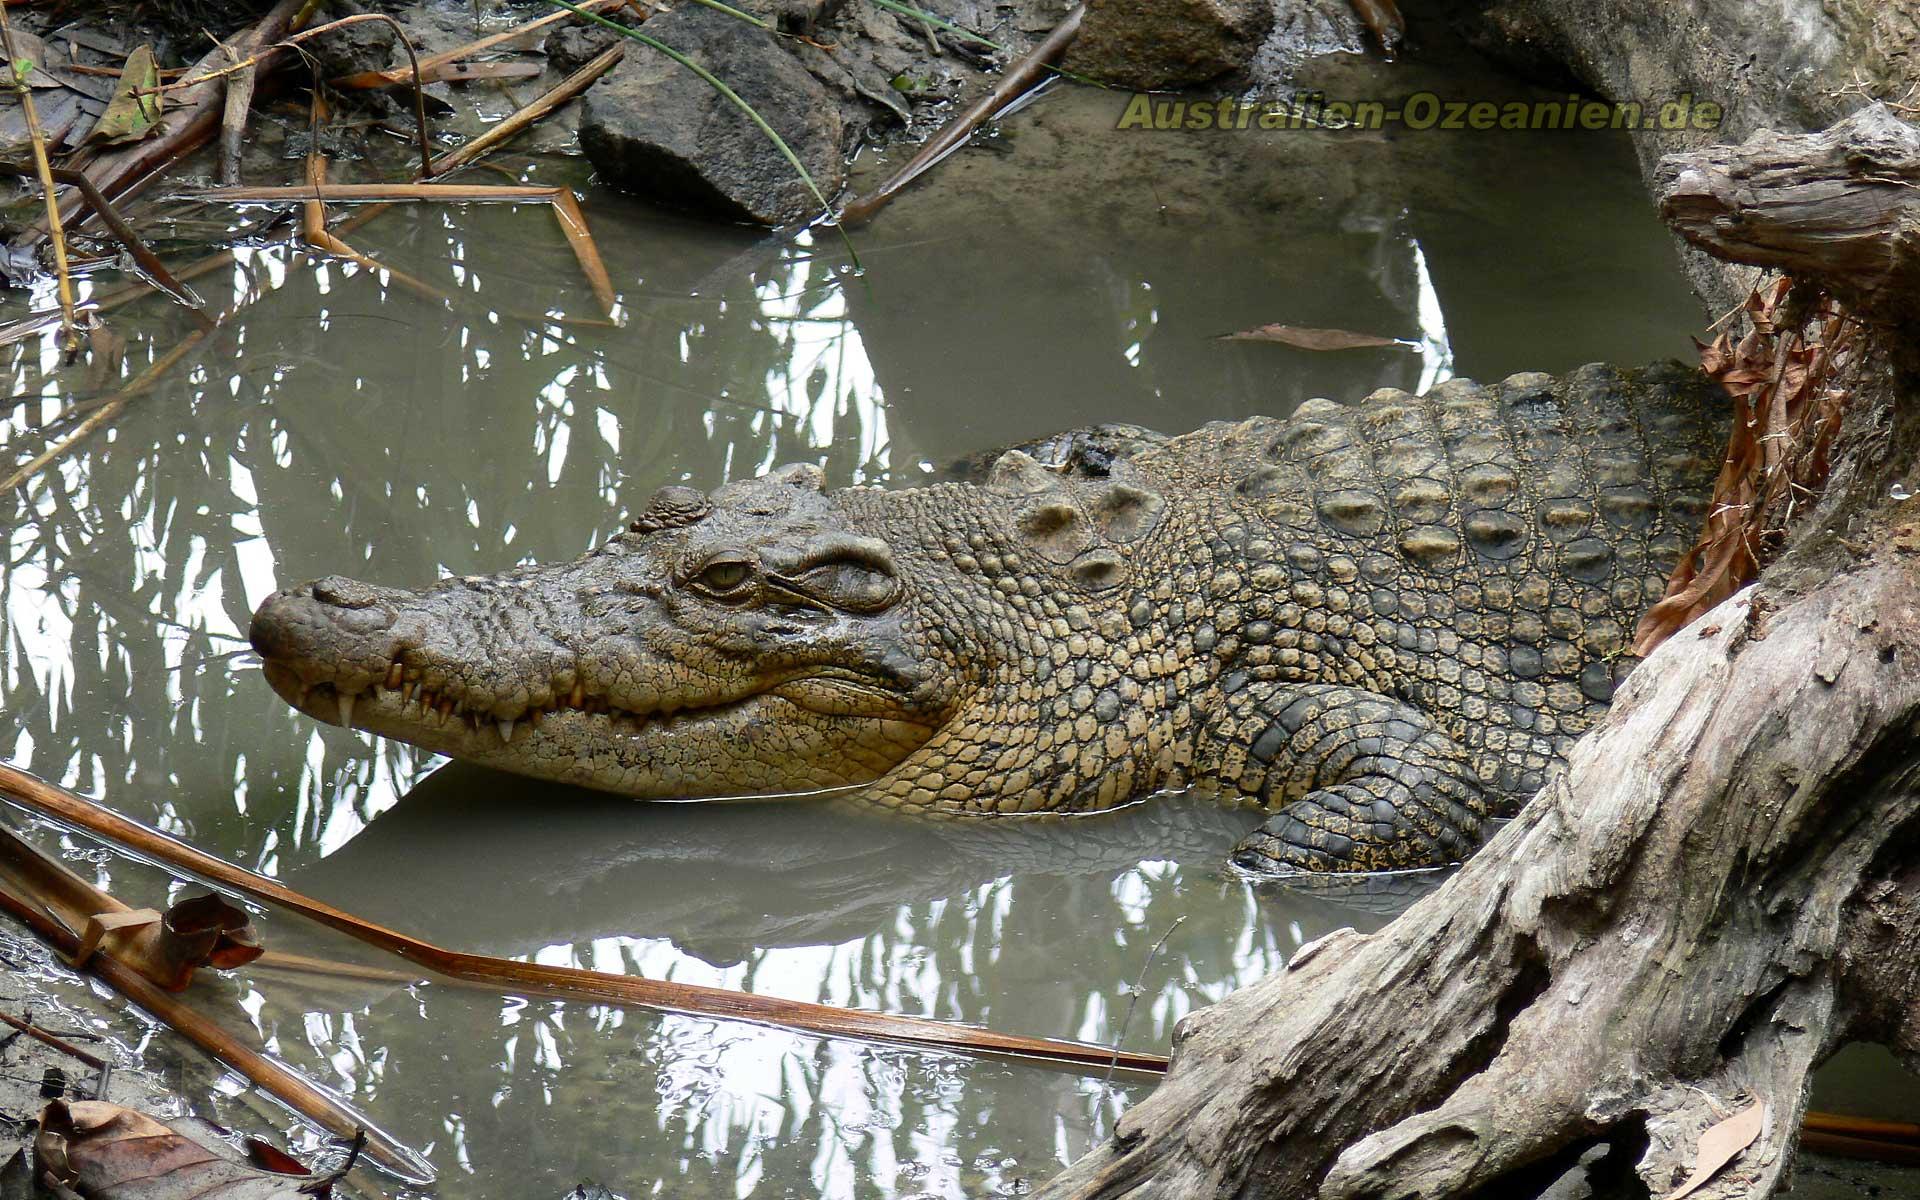 wallpaper crocodile animals australia 1920x1200 1920x1200